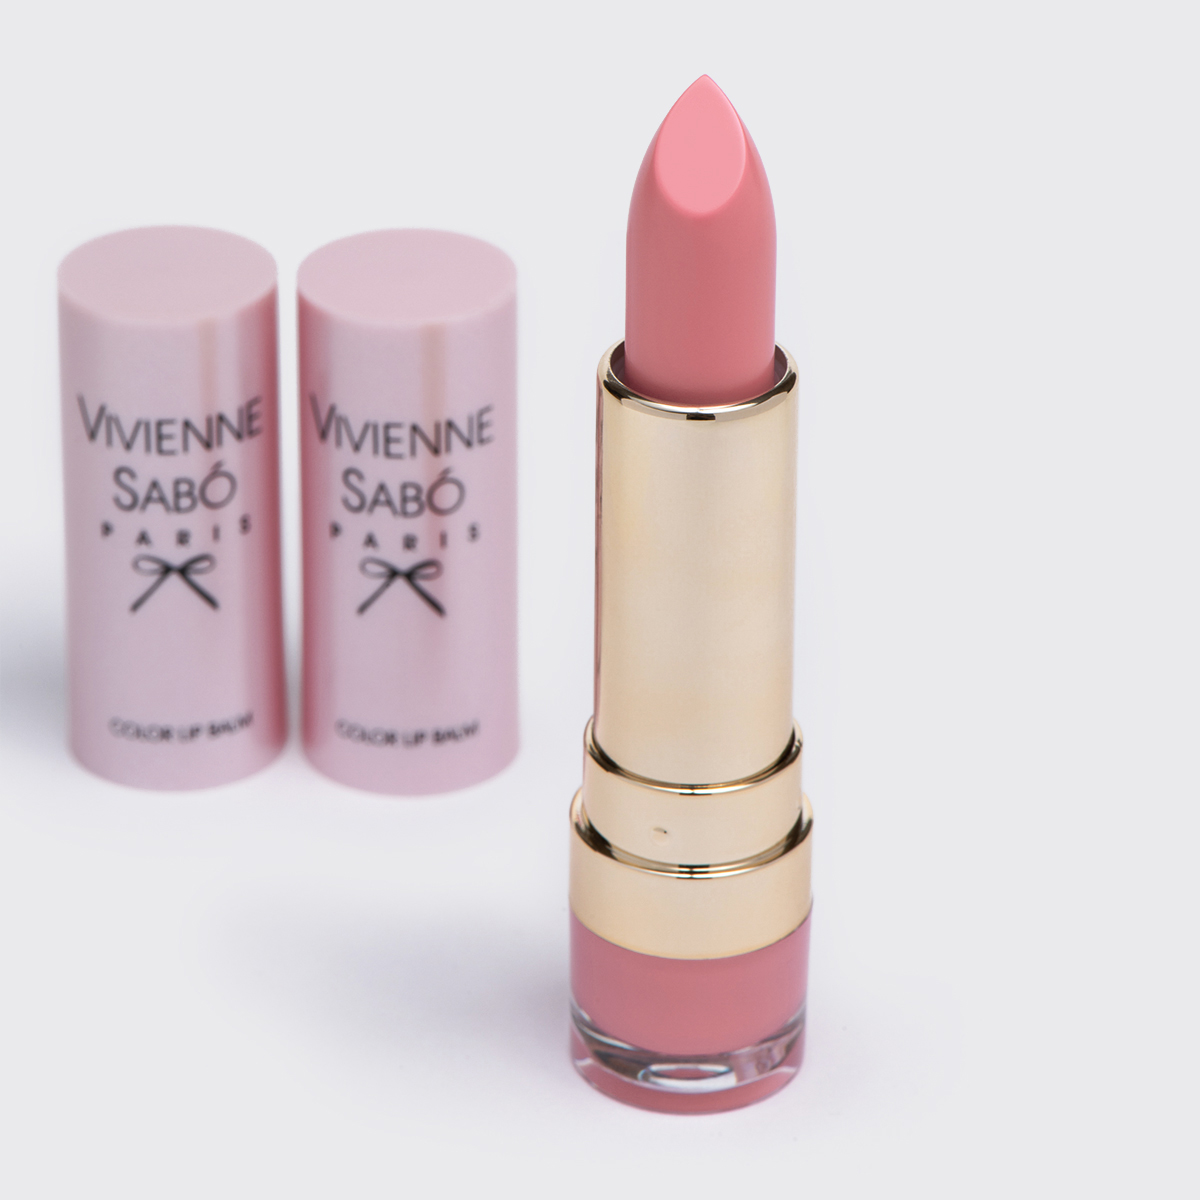 Vivienne Sabo - Lipstick Balm Lippenbalsam